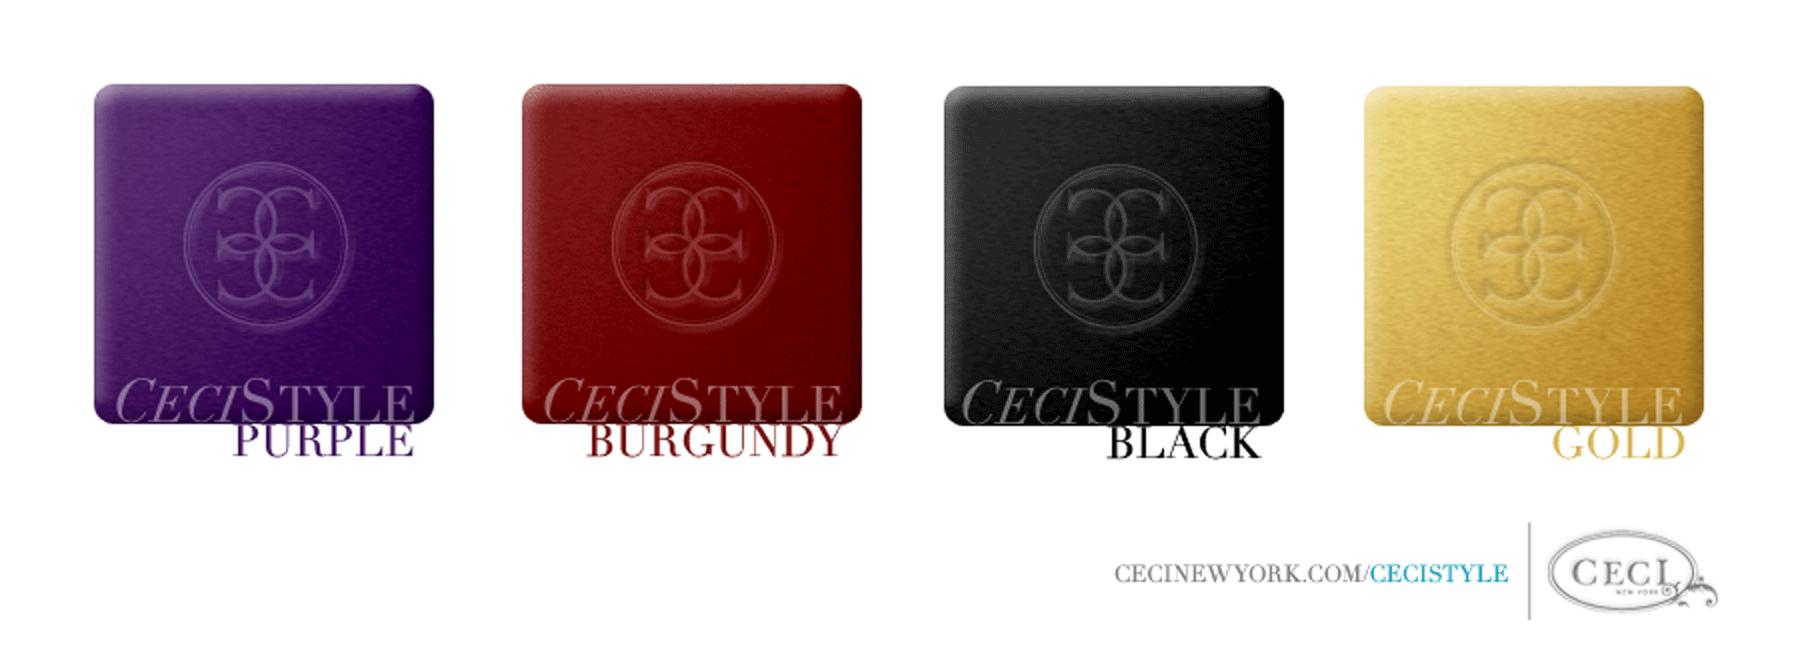 Ceci's Color Stories - Black & Gold Wedding Colors - color swatches, purple, burgundy, black, gold, wedding